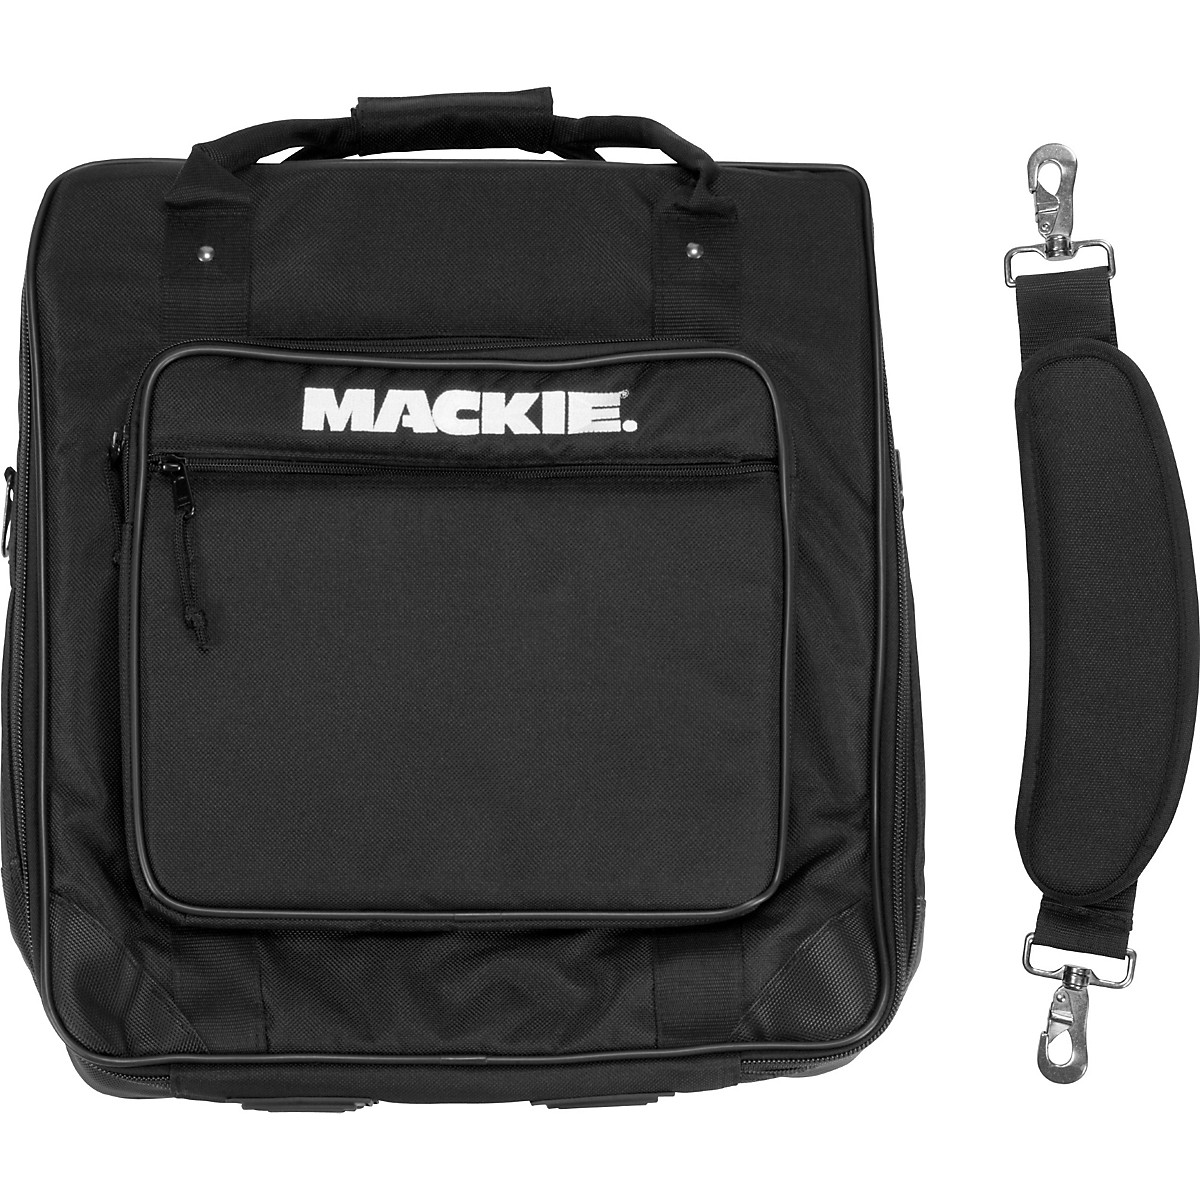 Mackie 1604-VLZ  Bag